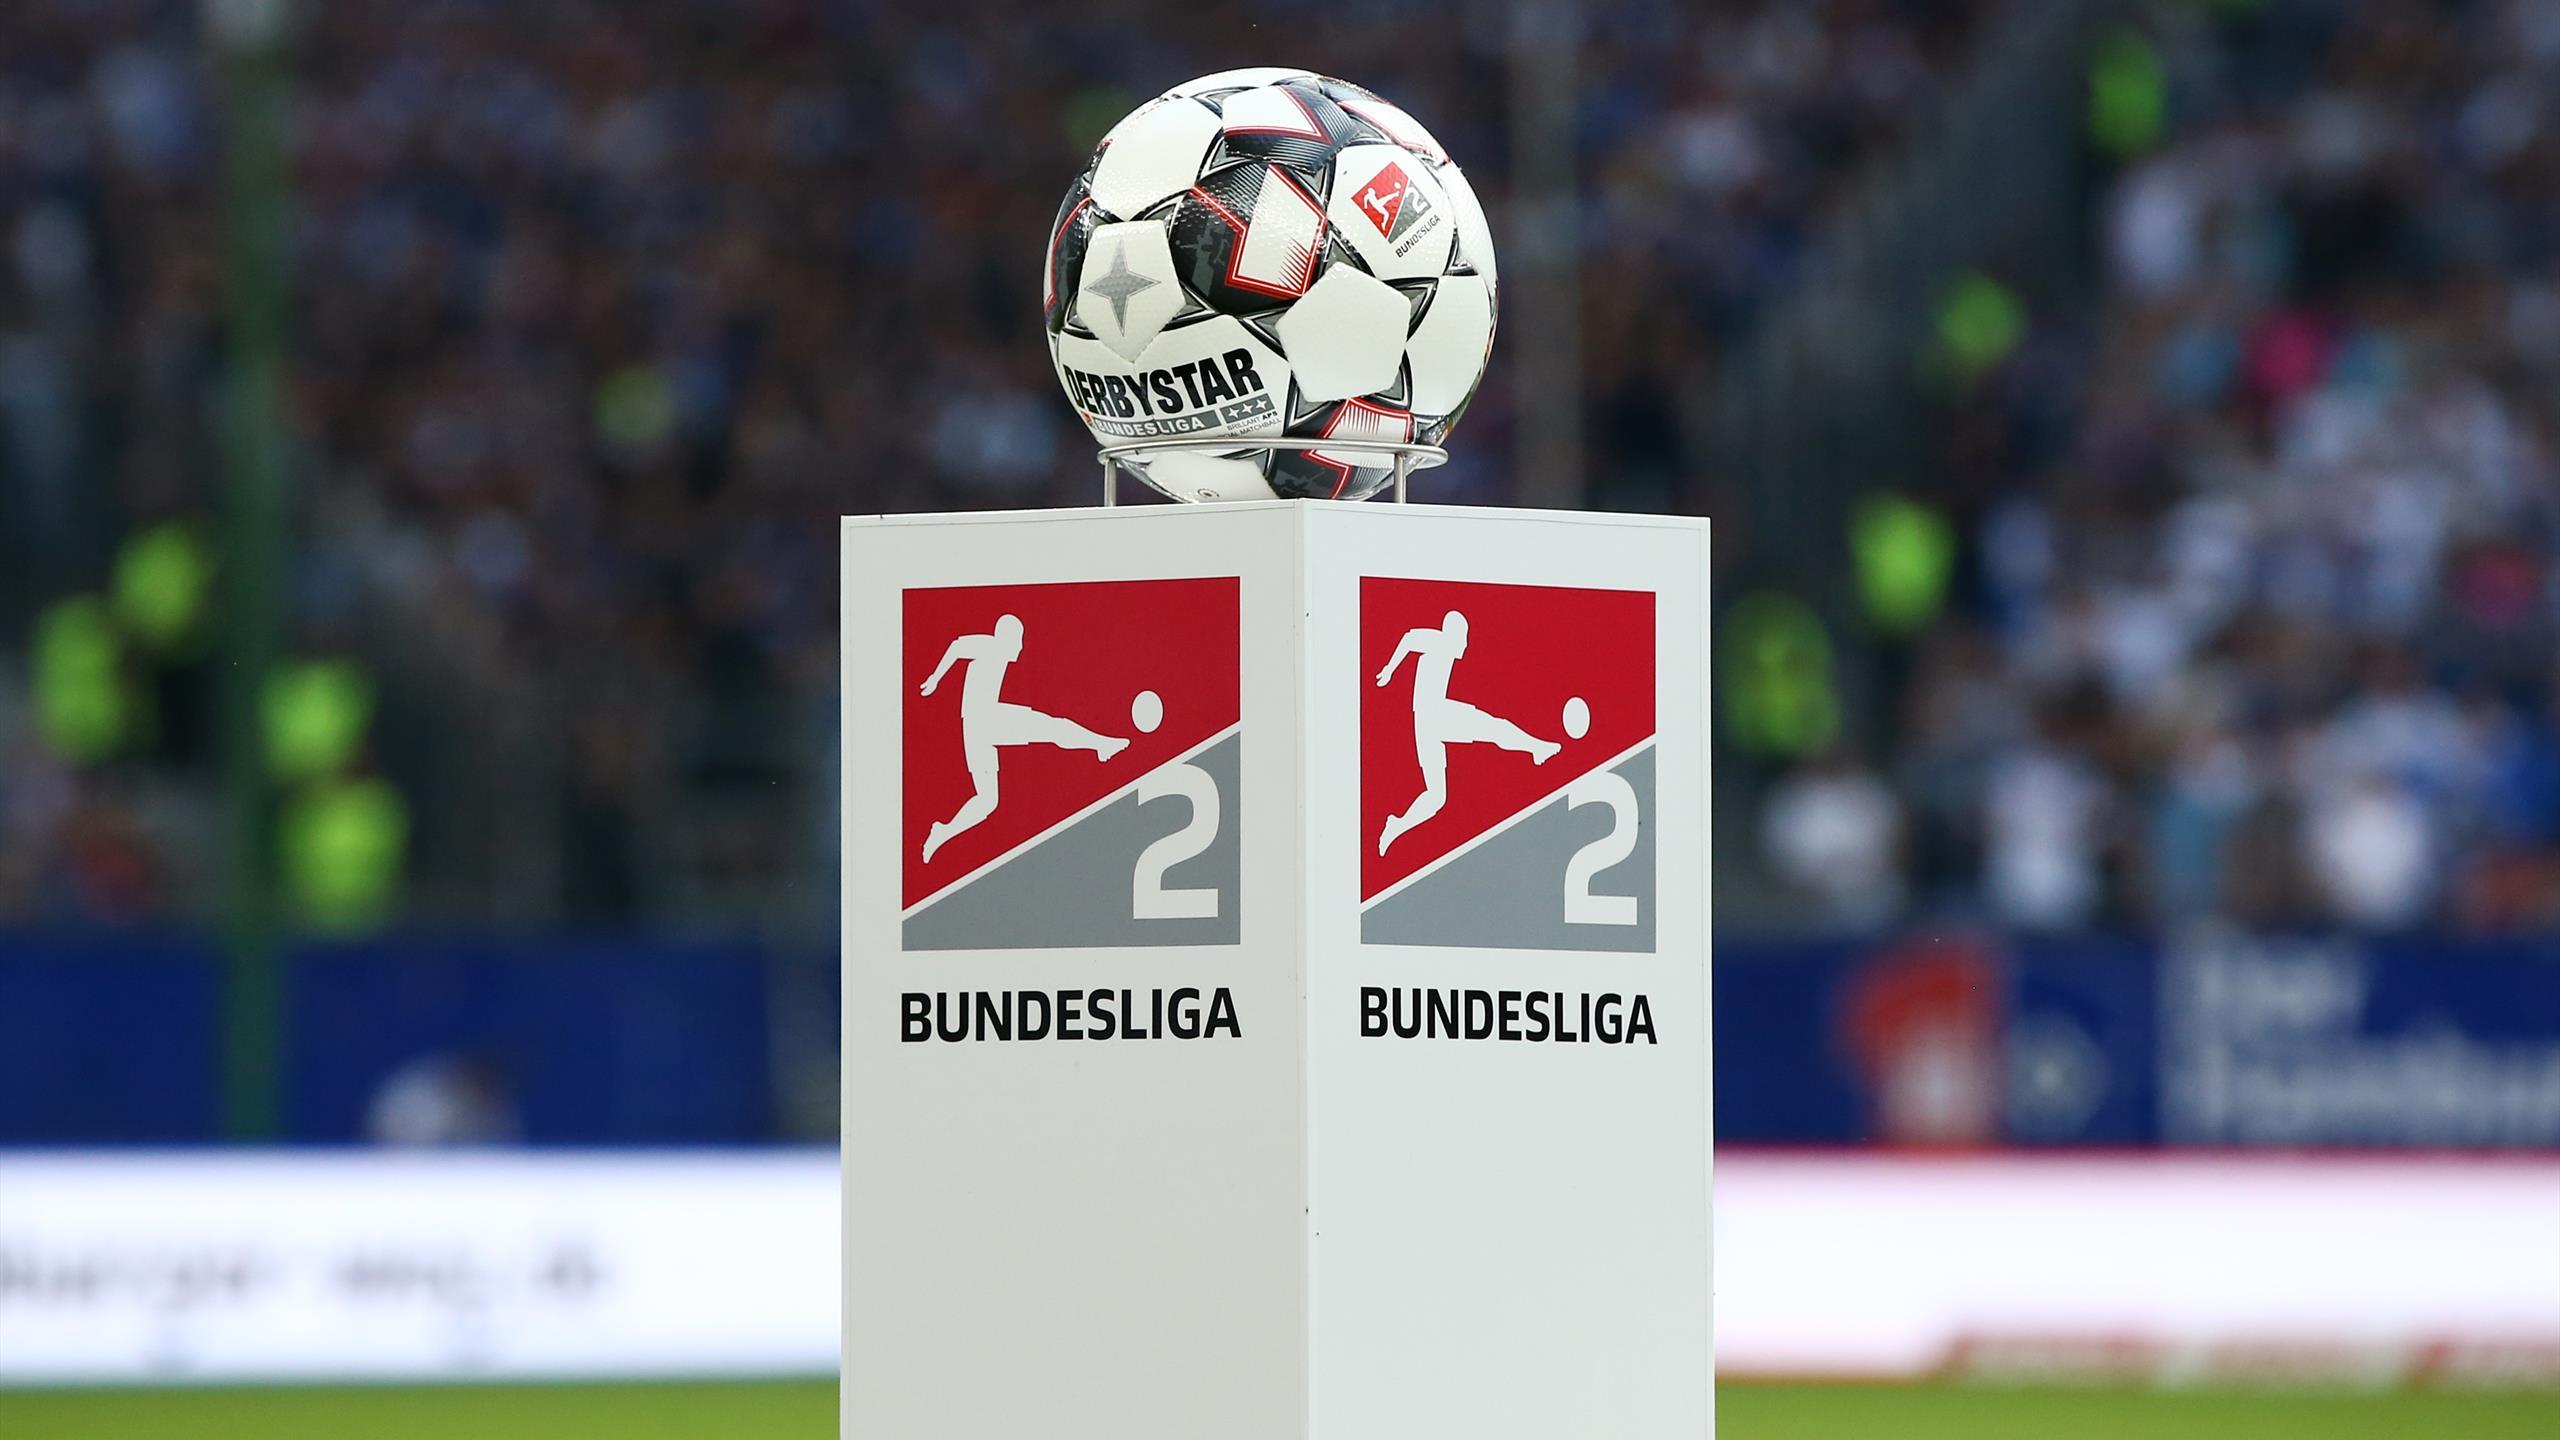 Montagsspiele Bundesliga 2021